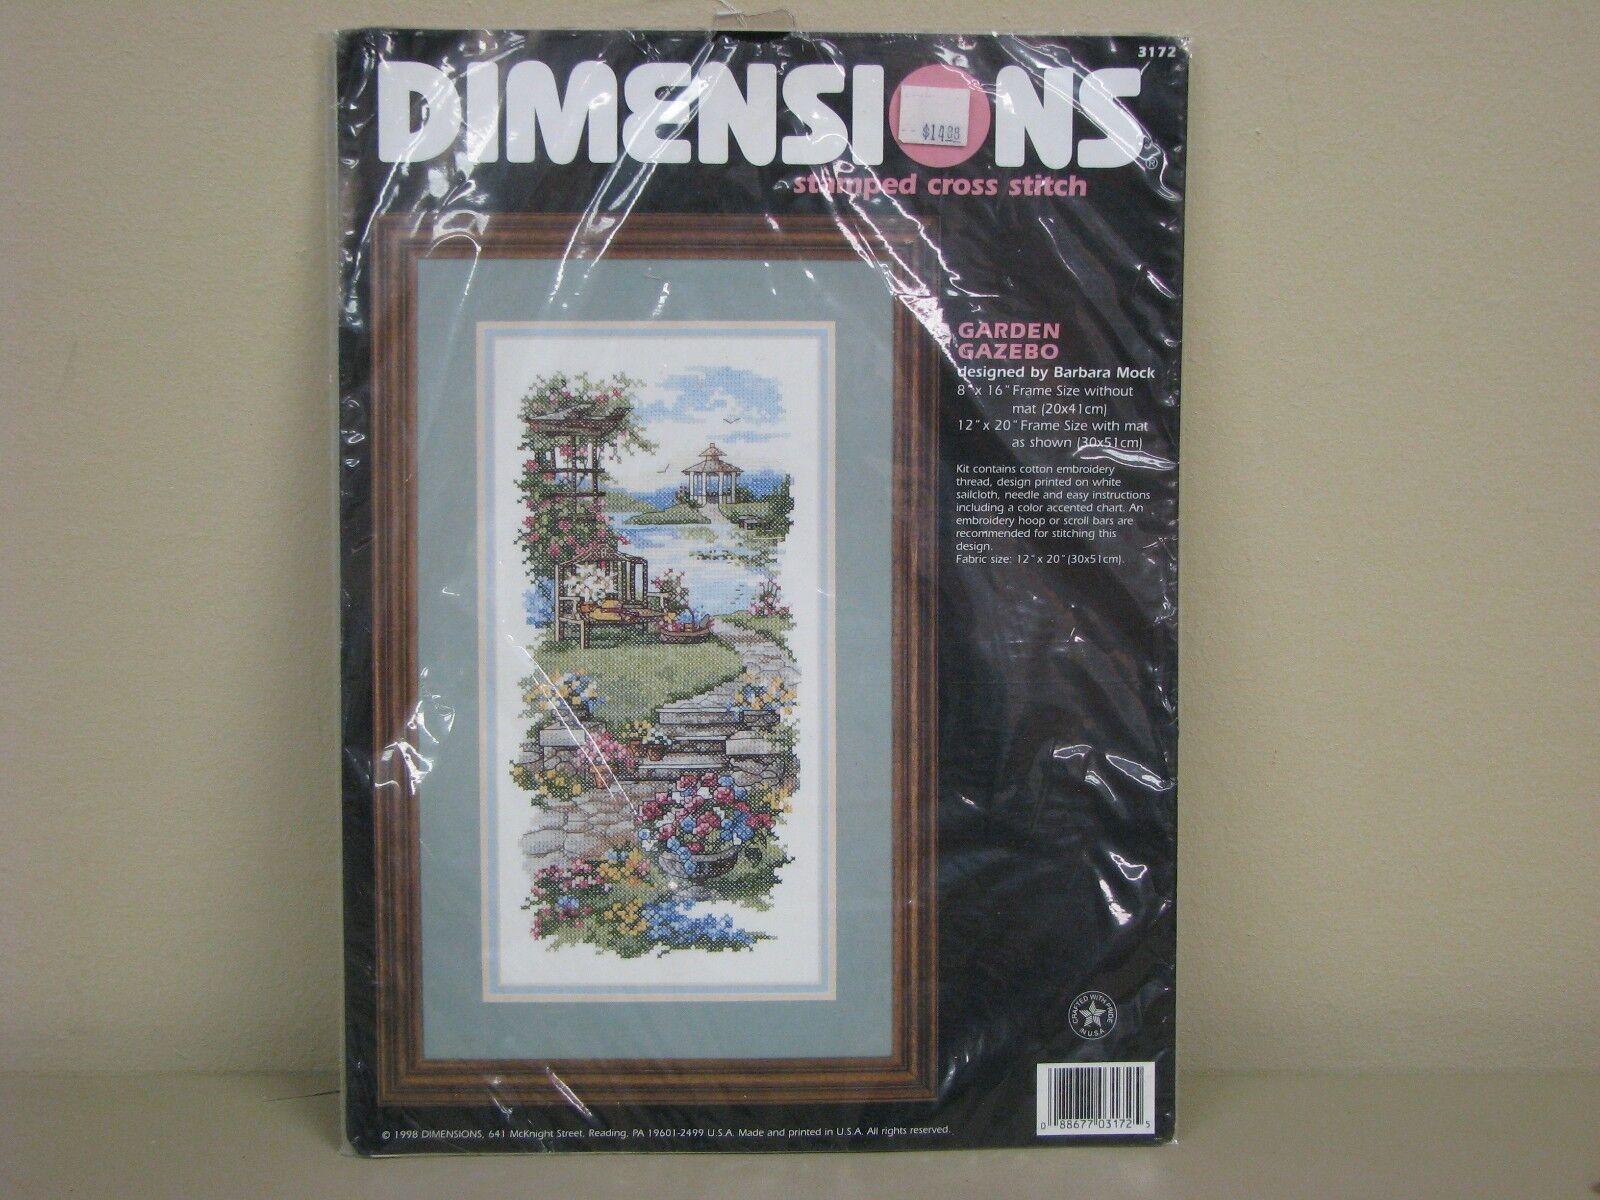 Dimensions Garden Gazebo Stamped Cross Stitch Kit 3172 | eBay